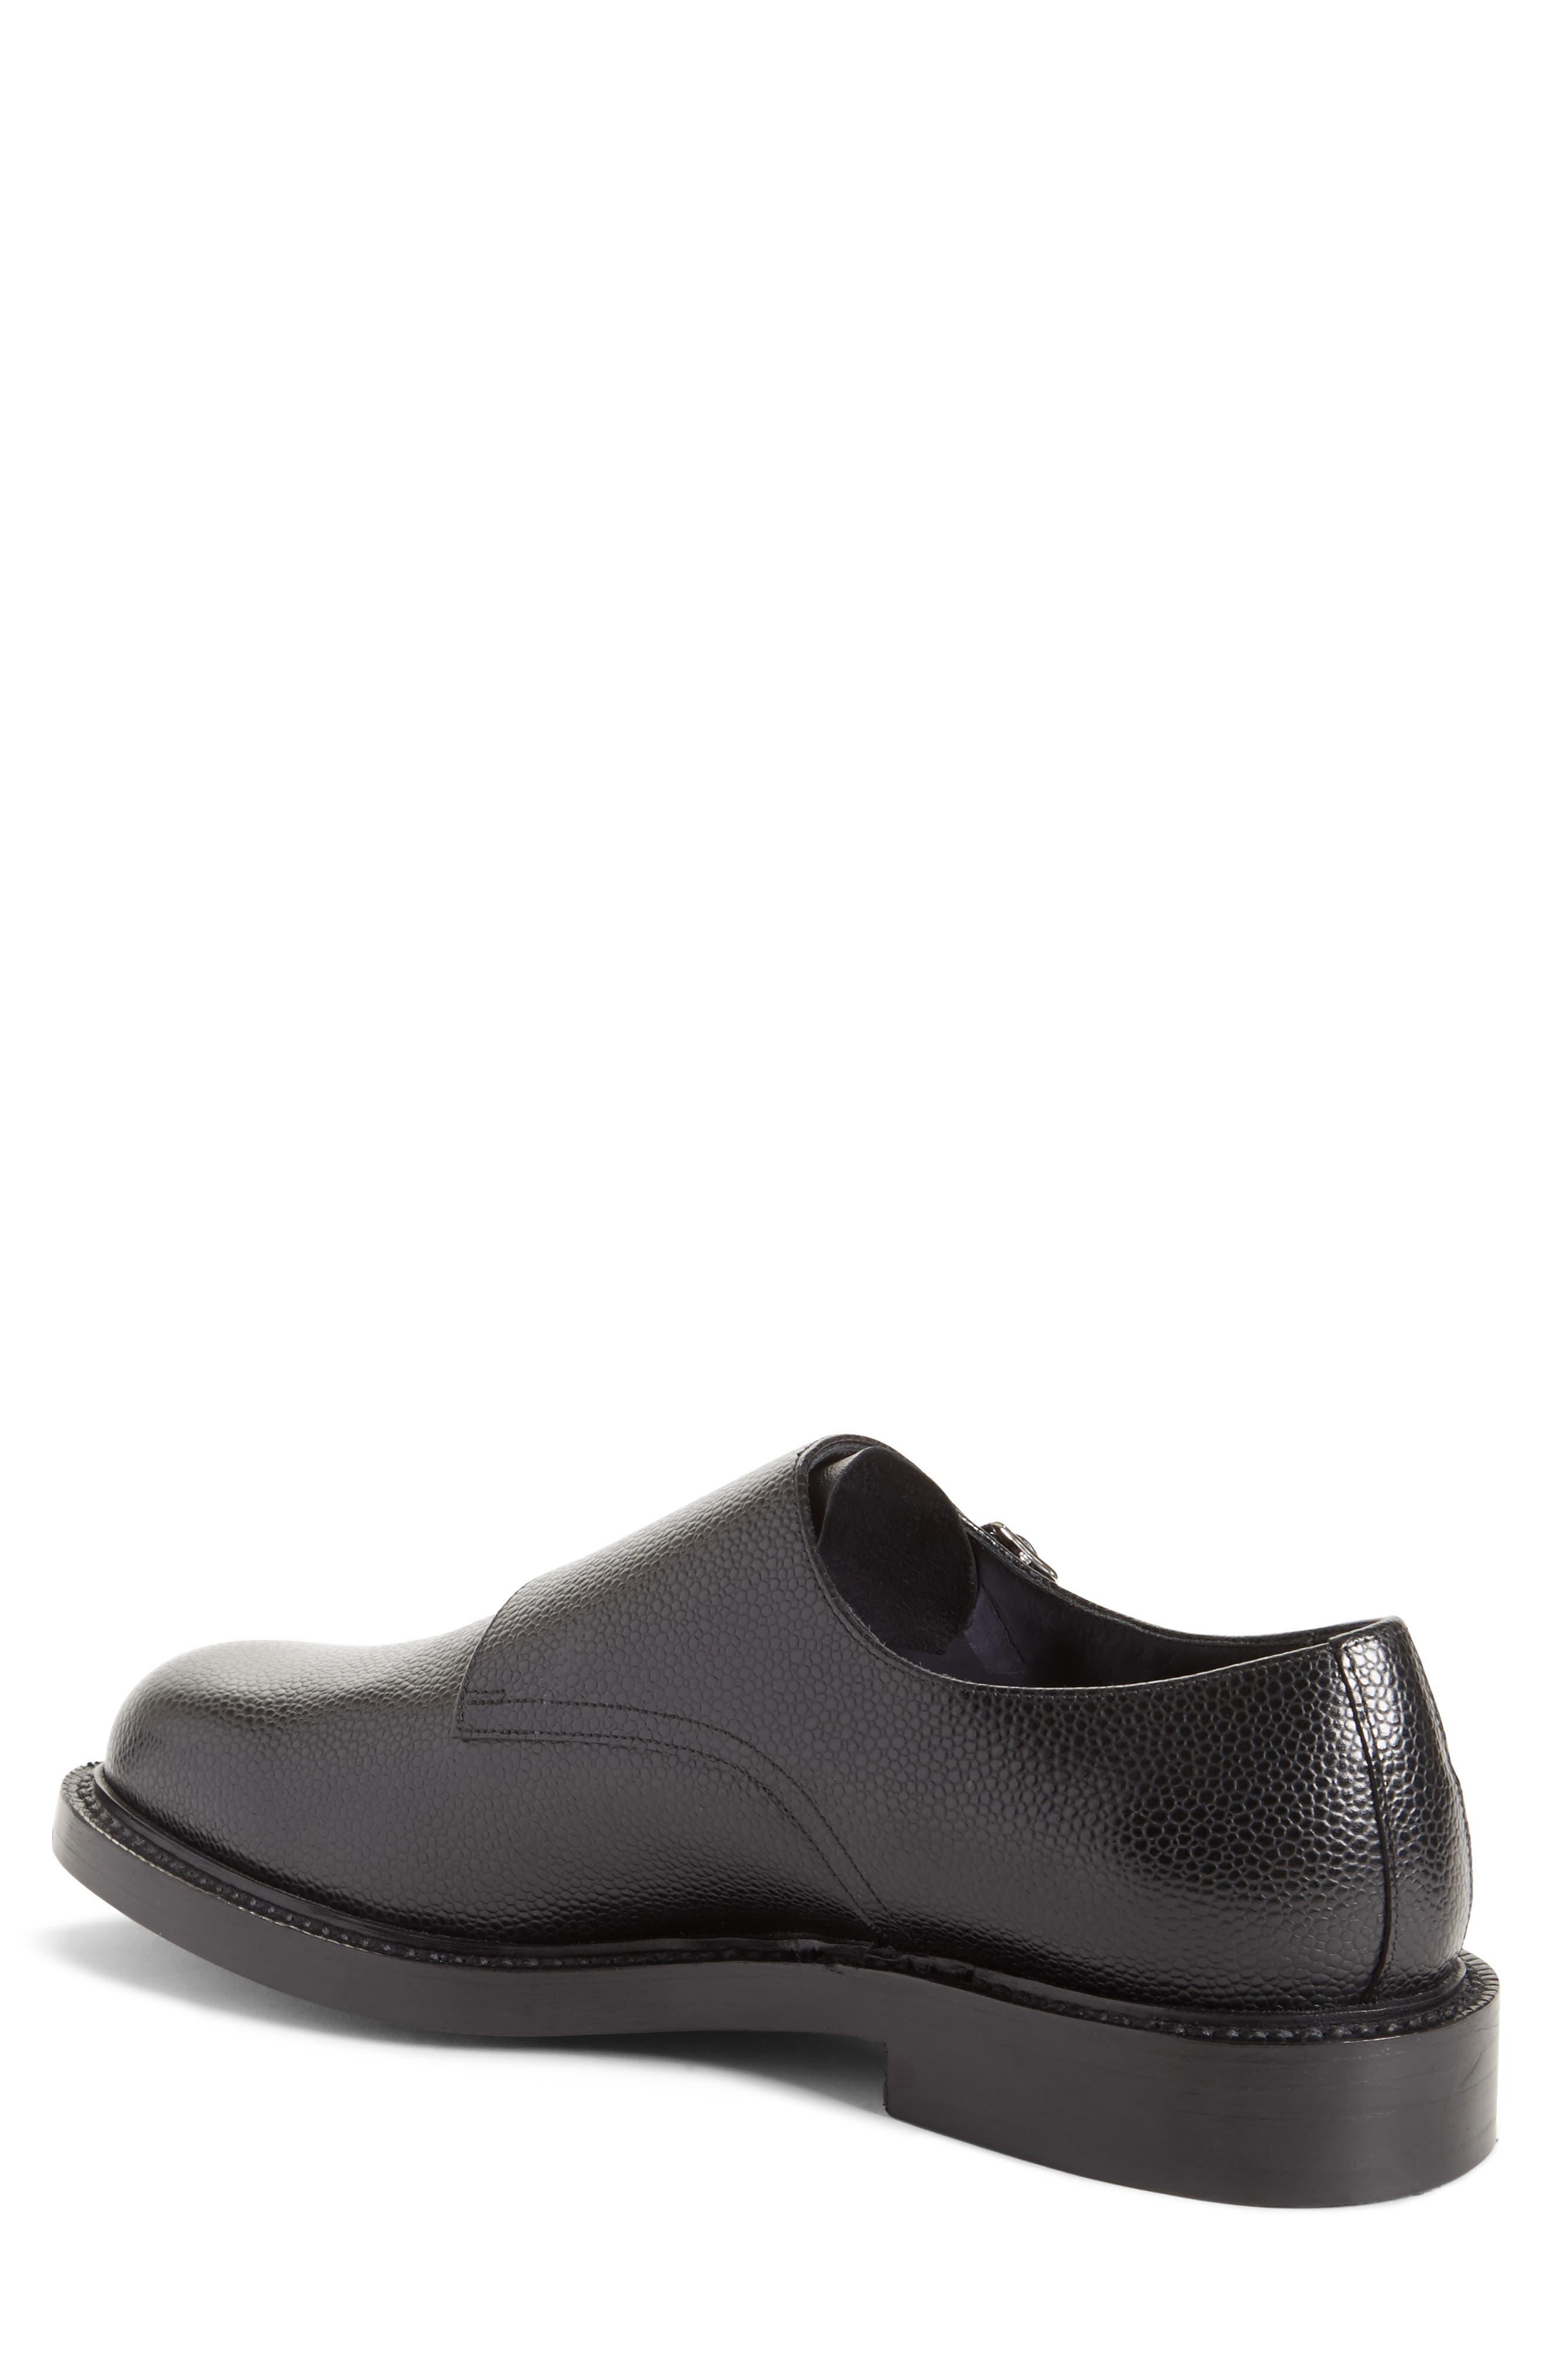 Alternate Image 2  - Calvin Klein 205W39NYC Hova Double Monk Strap Shoe (Men)